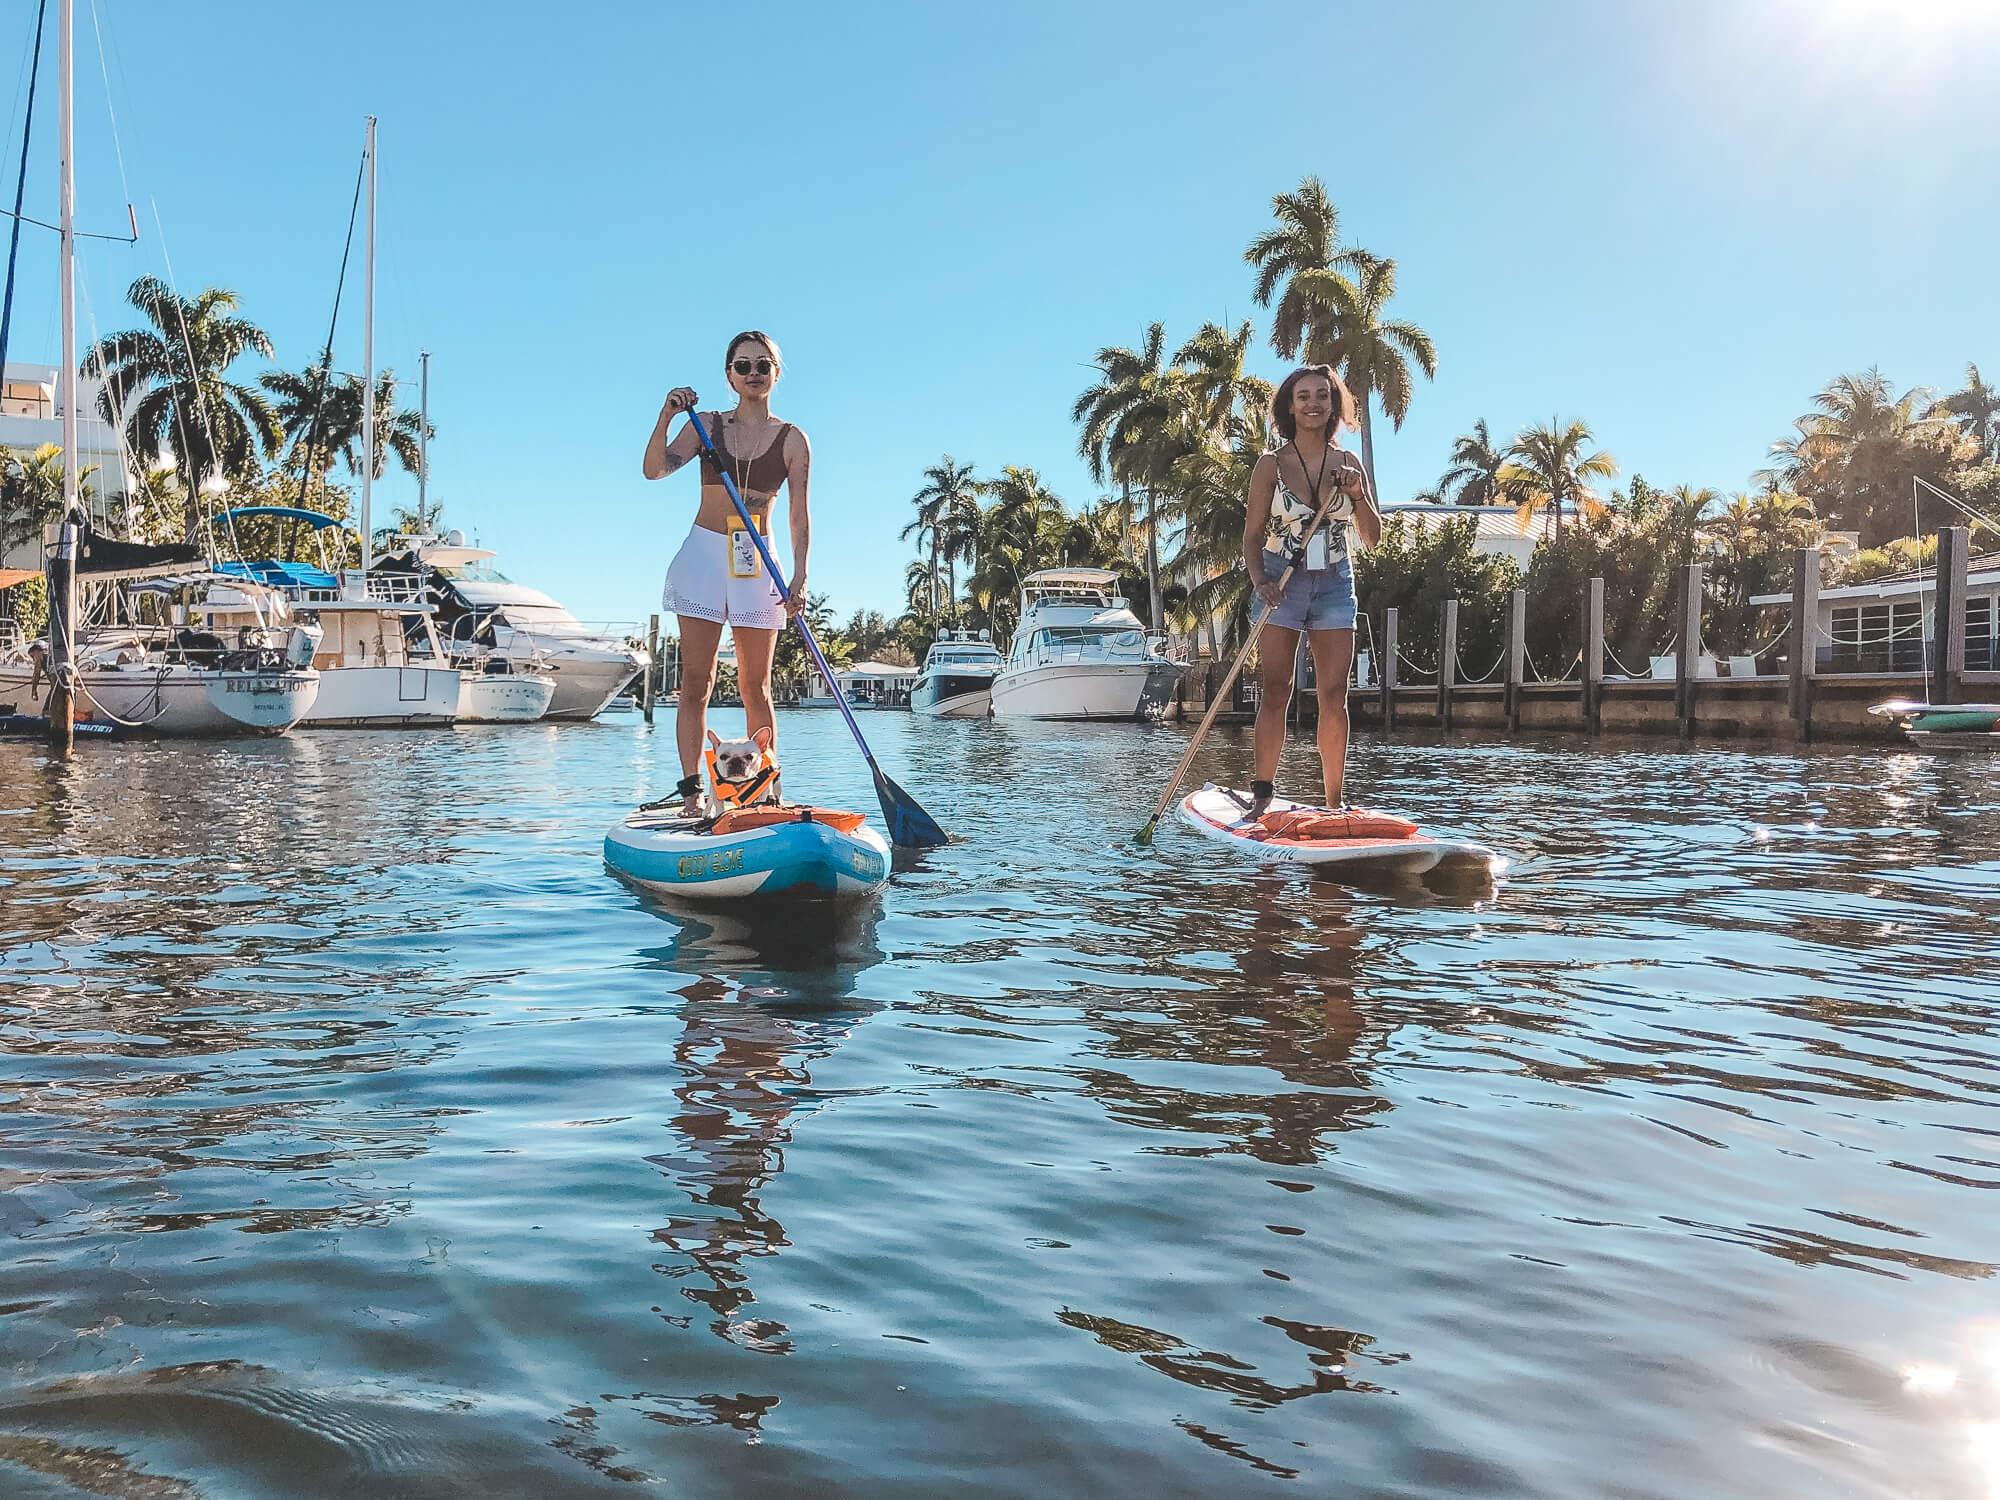 Paddle boarding in Florida - ochristine